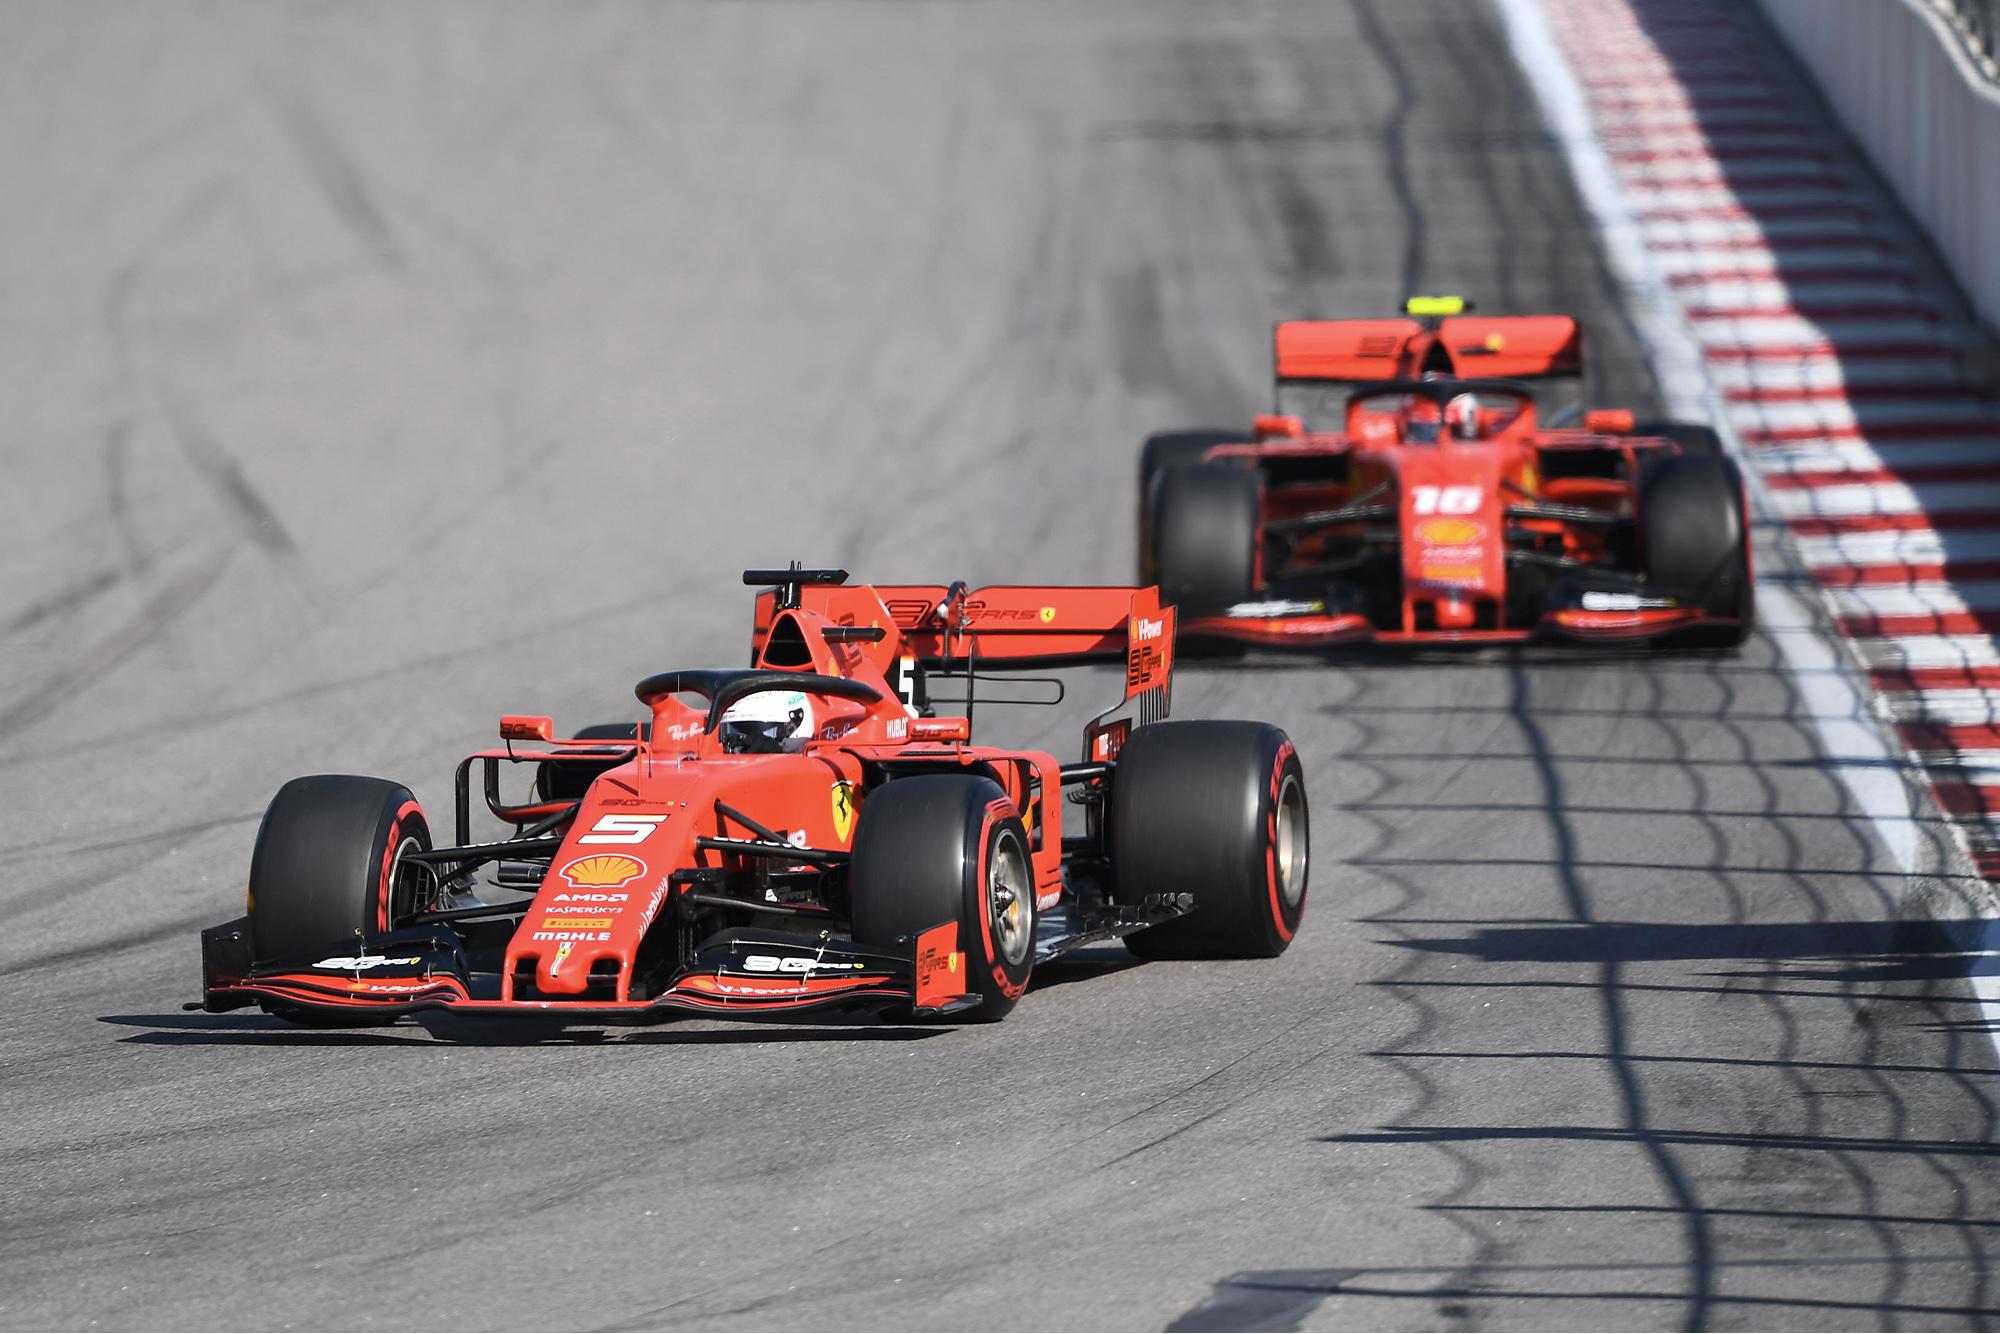 Sebastian Vettel leads during the 2019 Russian Grand Prix